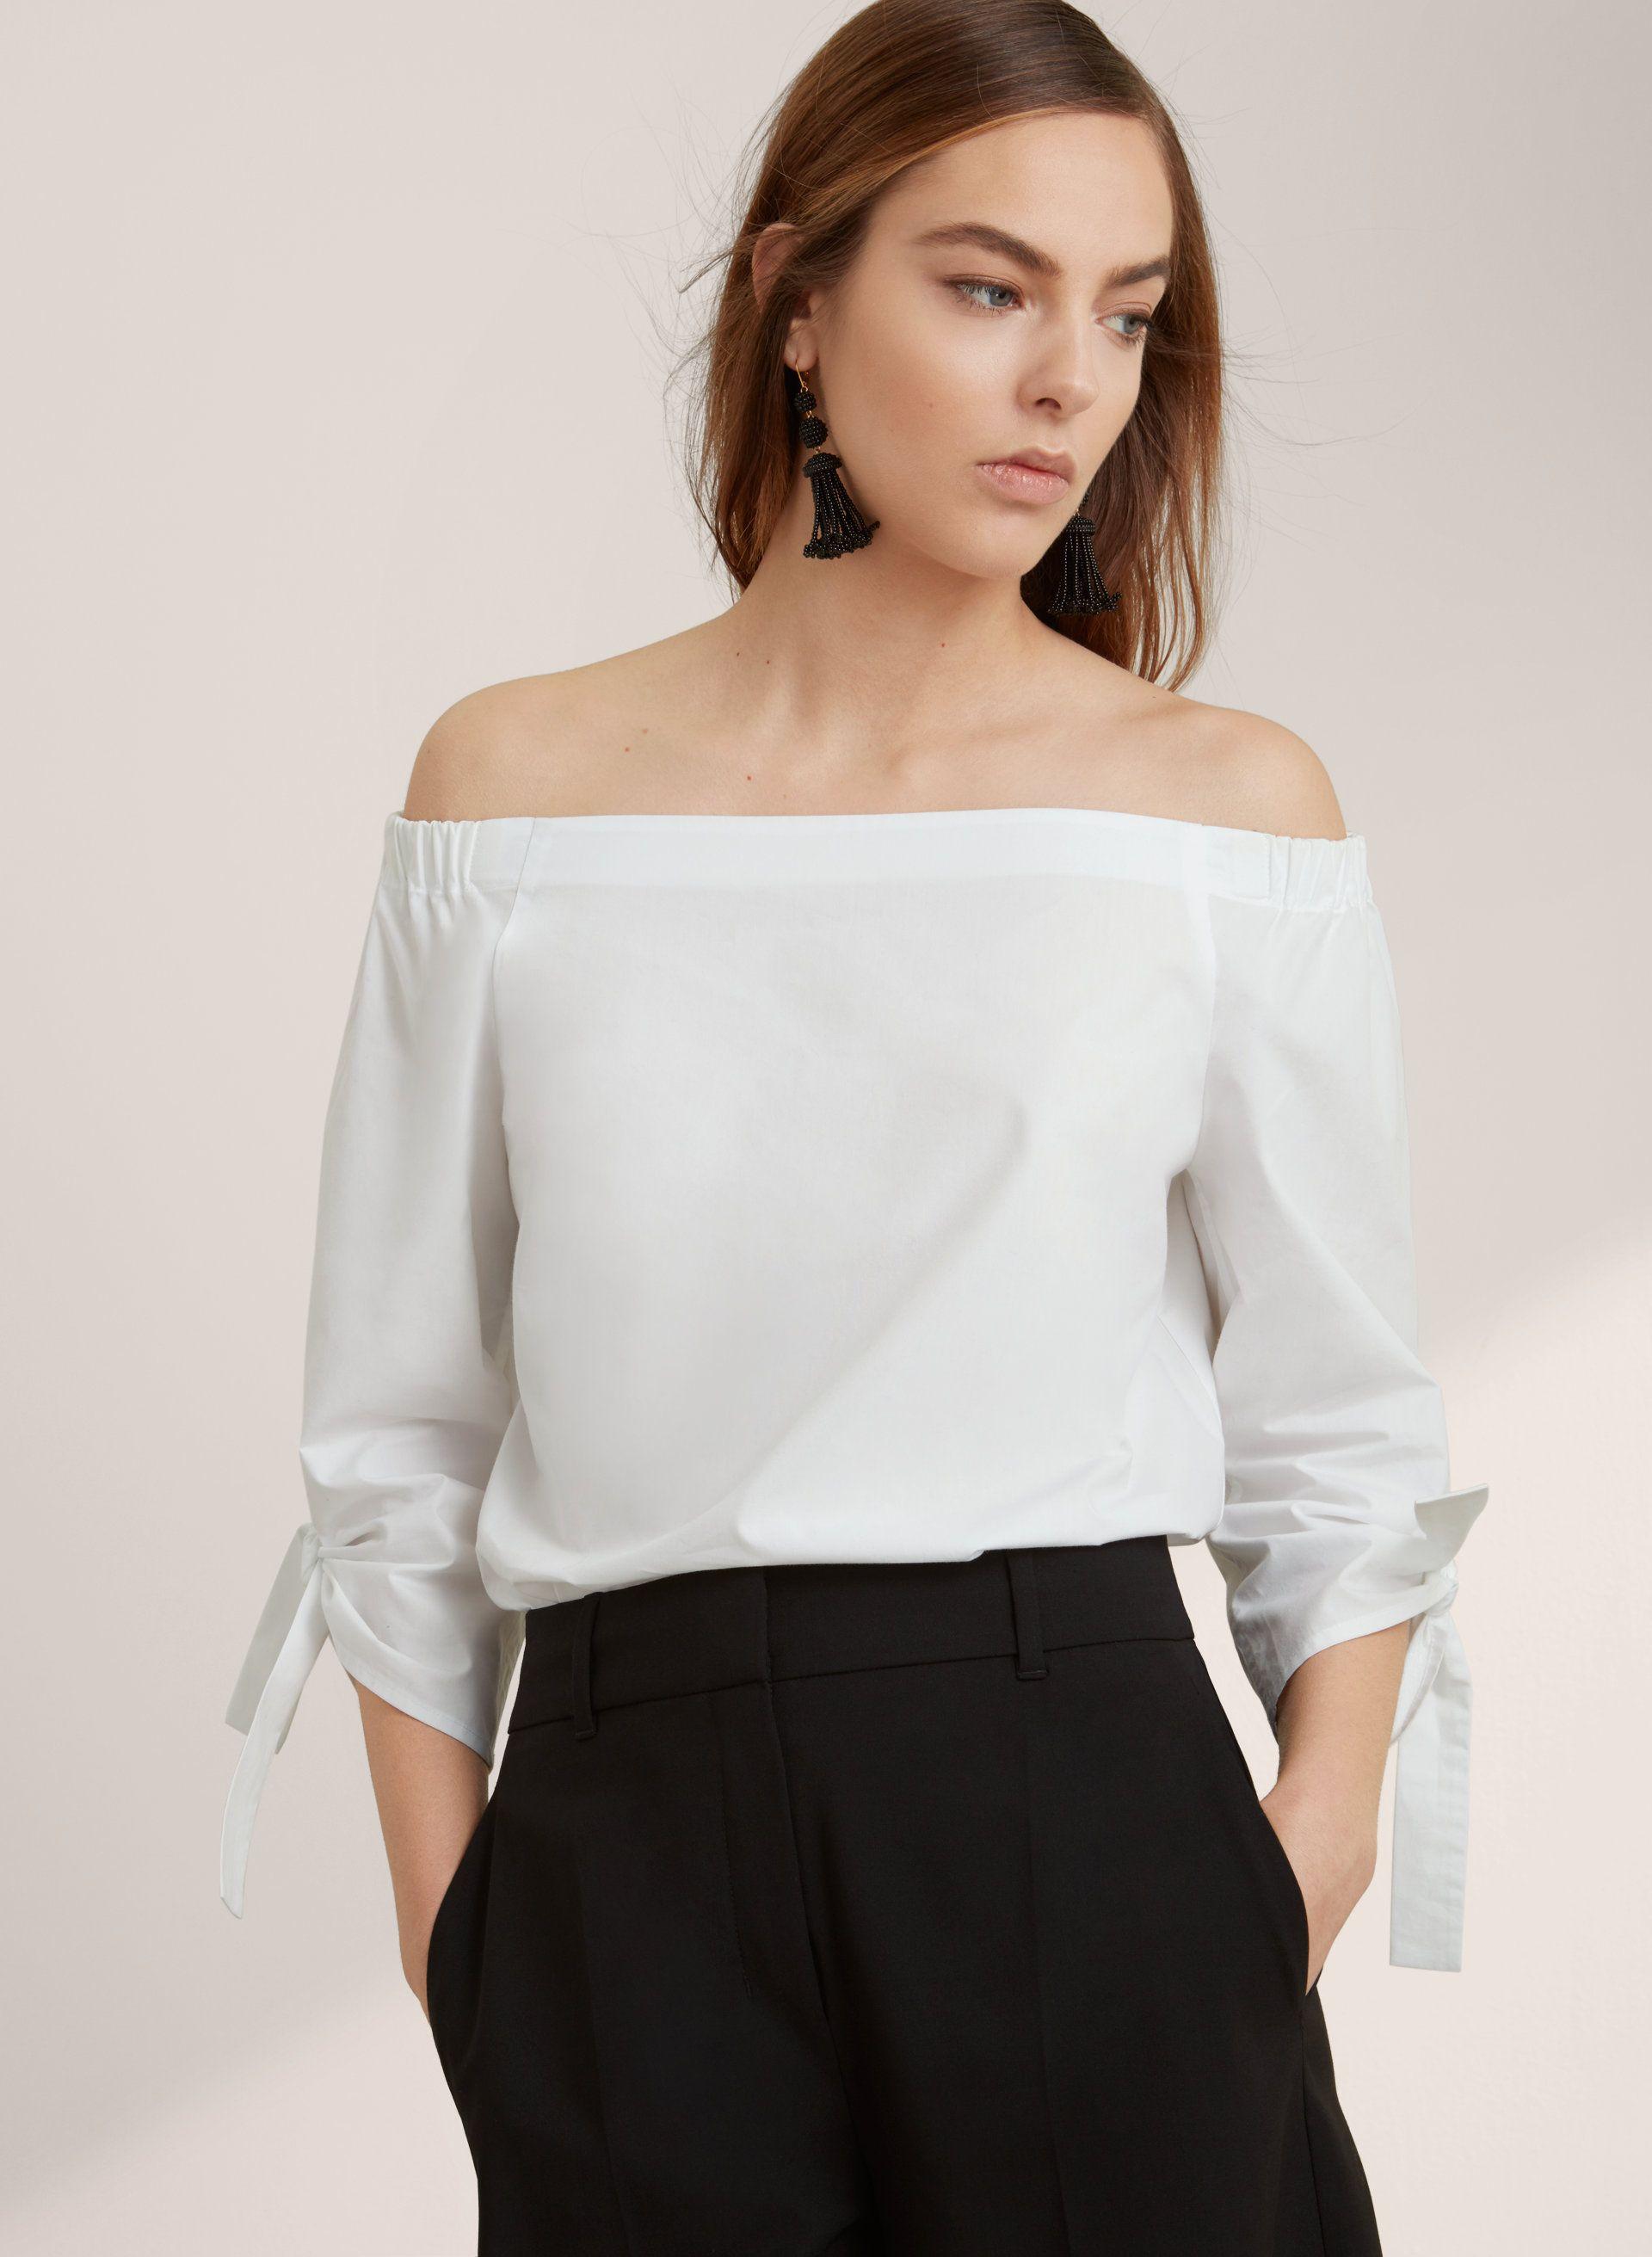 5848c8e157bf65 Malik blouse | Style | Tops, Blouse, Fashion